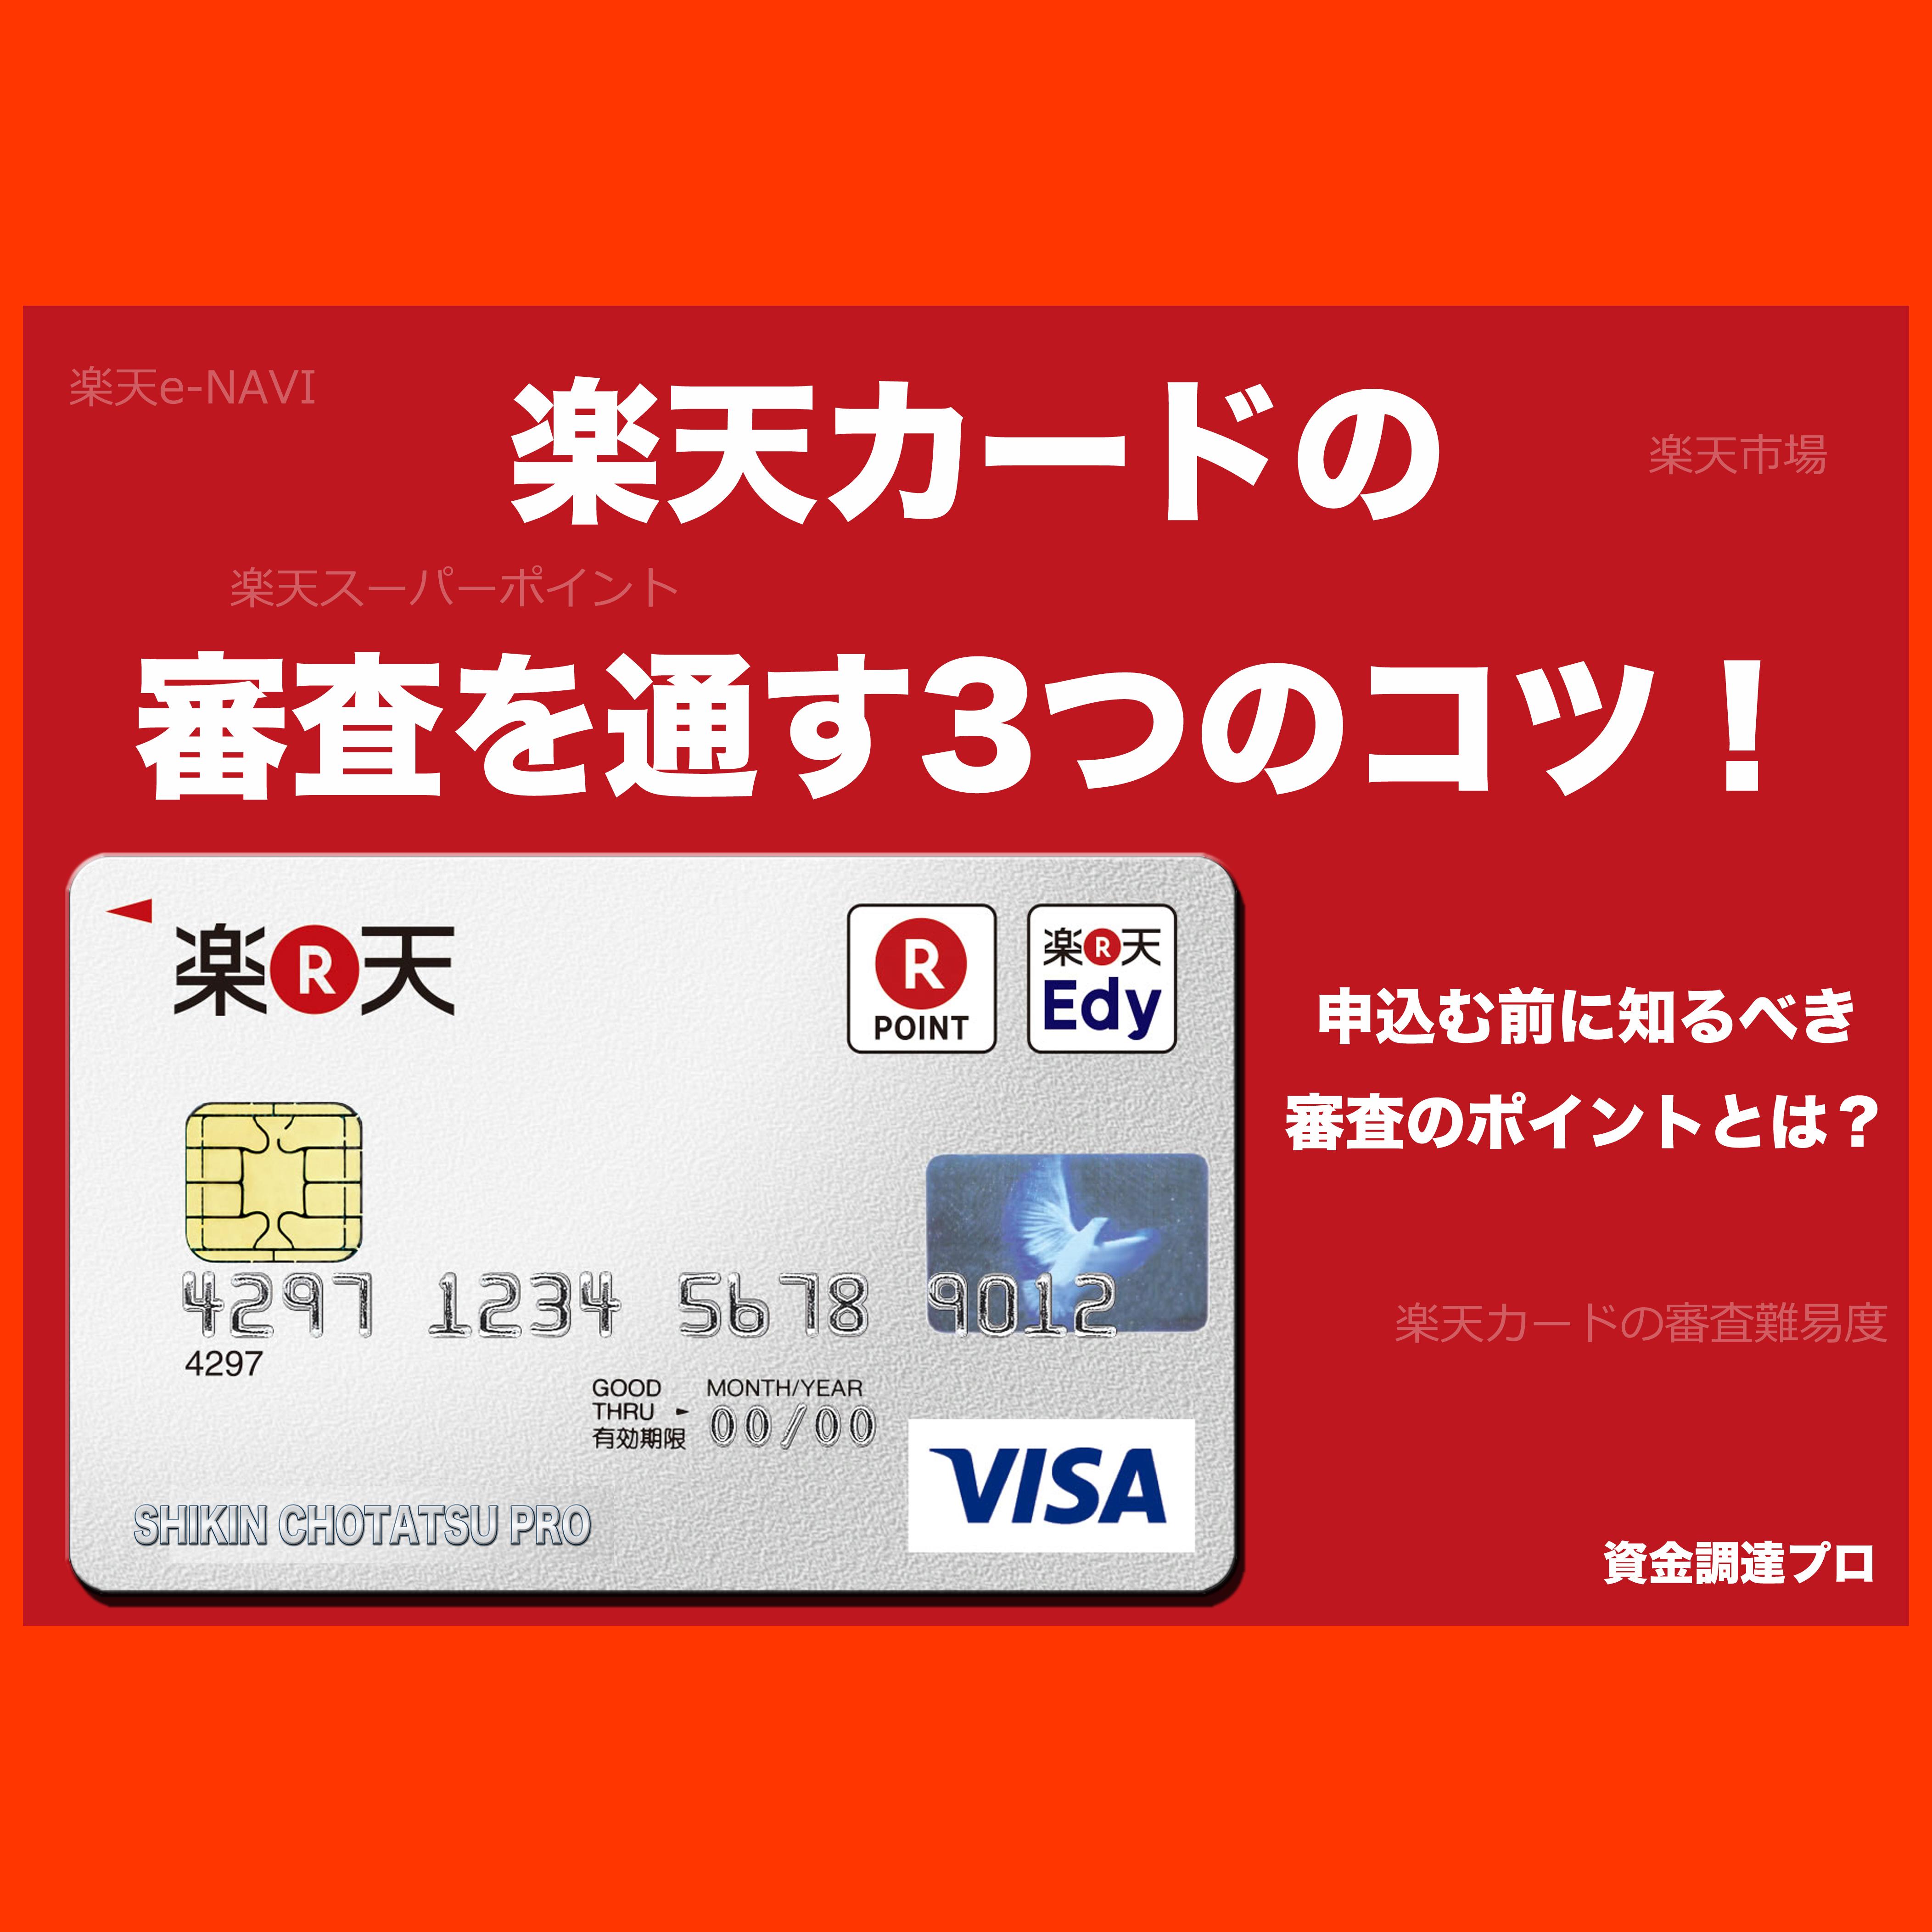 家族 カード 登録 楽天